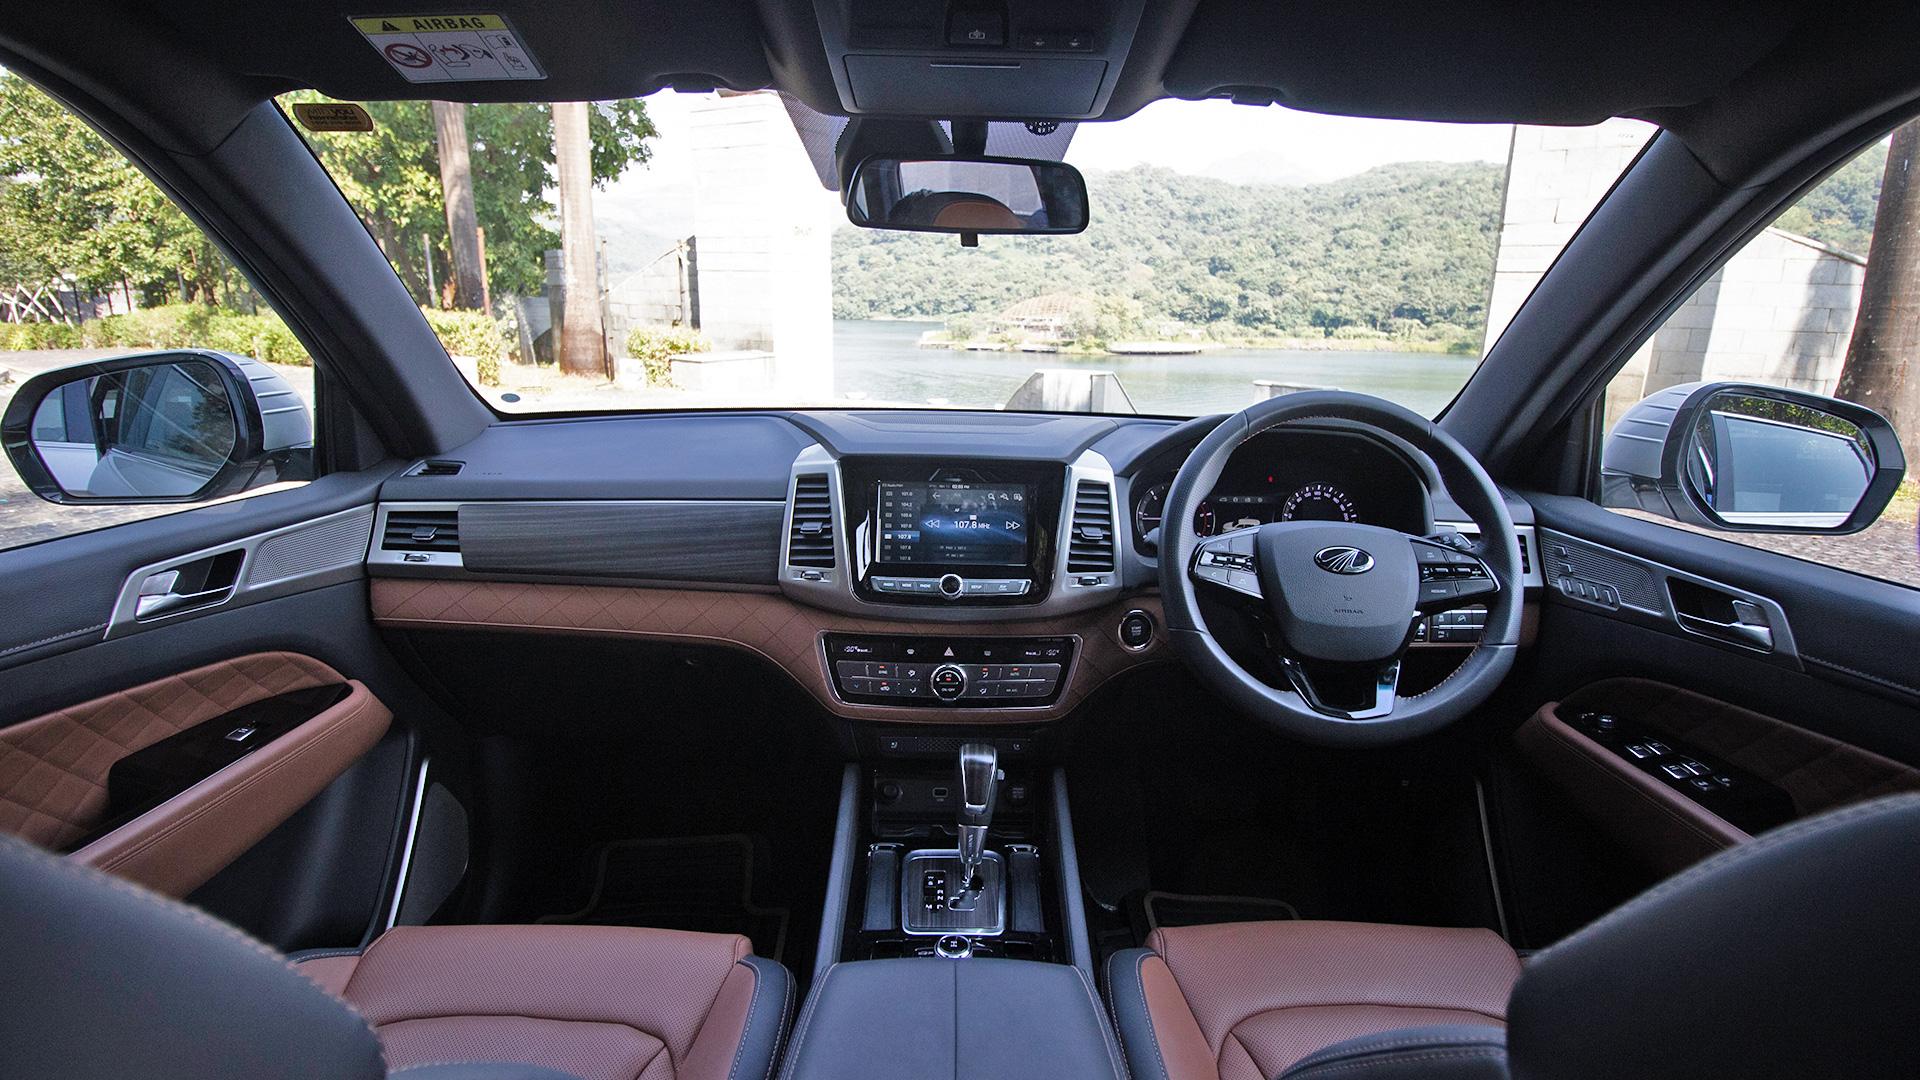 Mahindra Alturas G4 2019 2 2l Std Interior Car Photos Overdrive